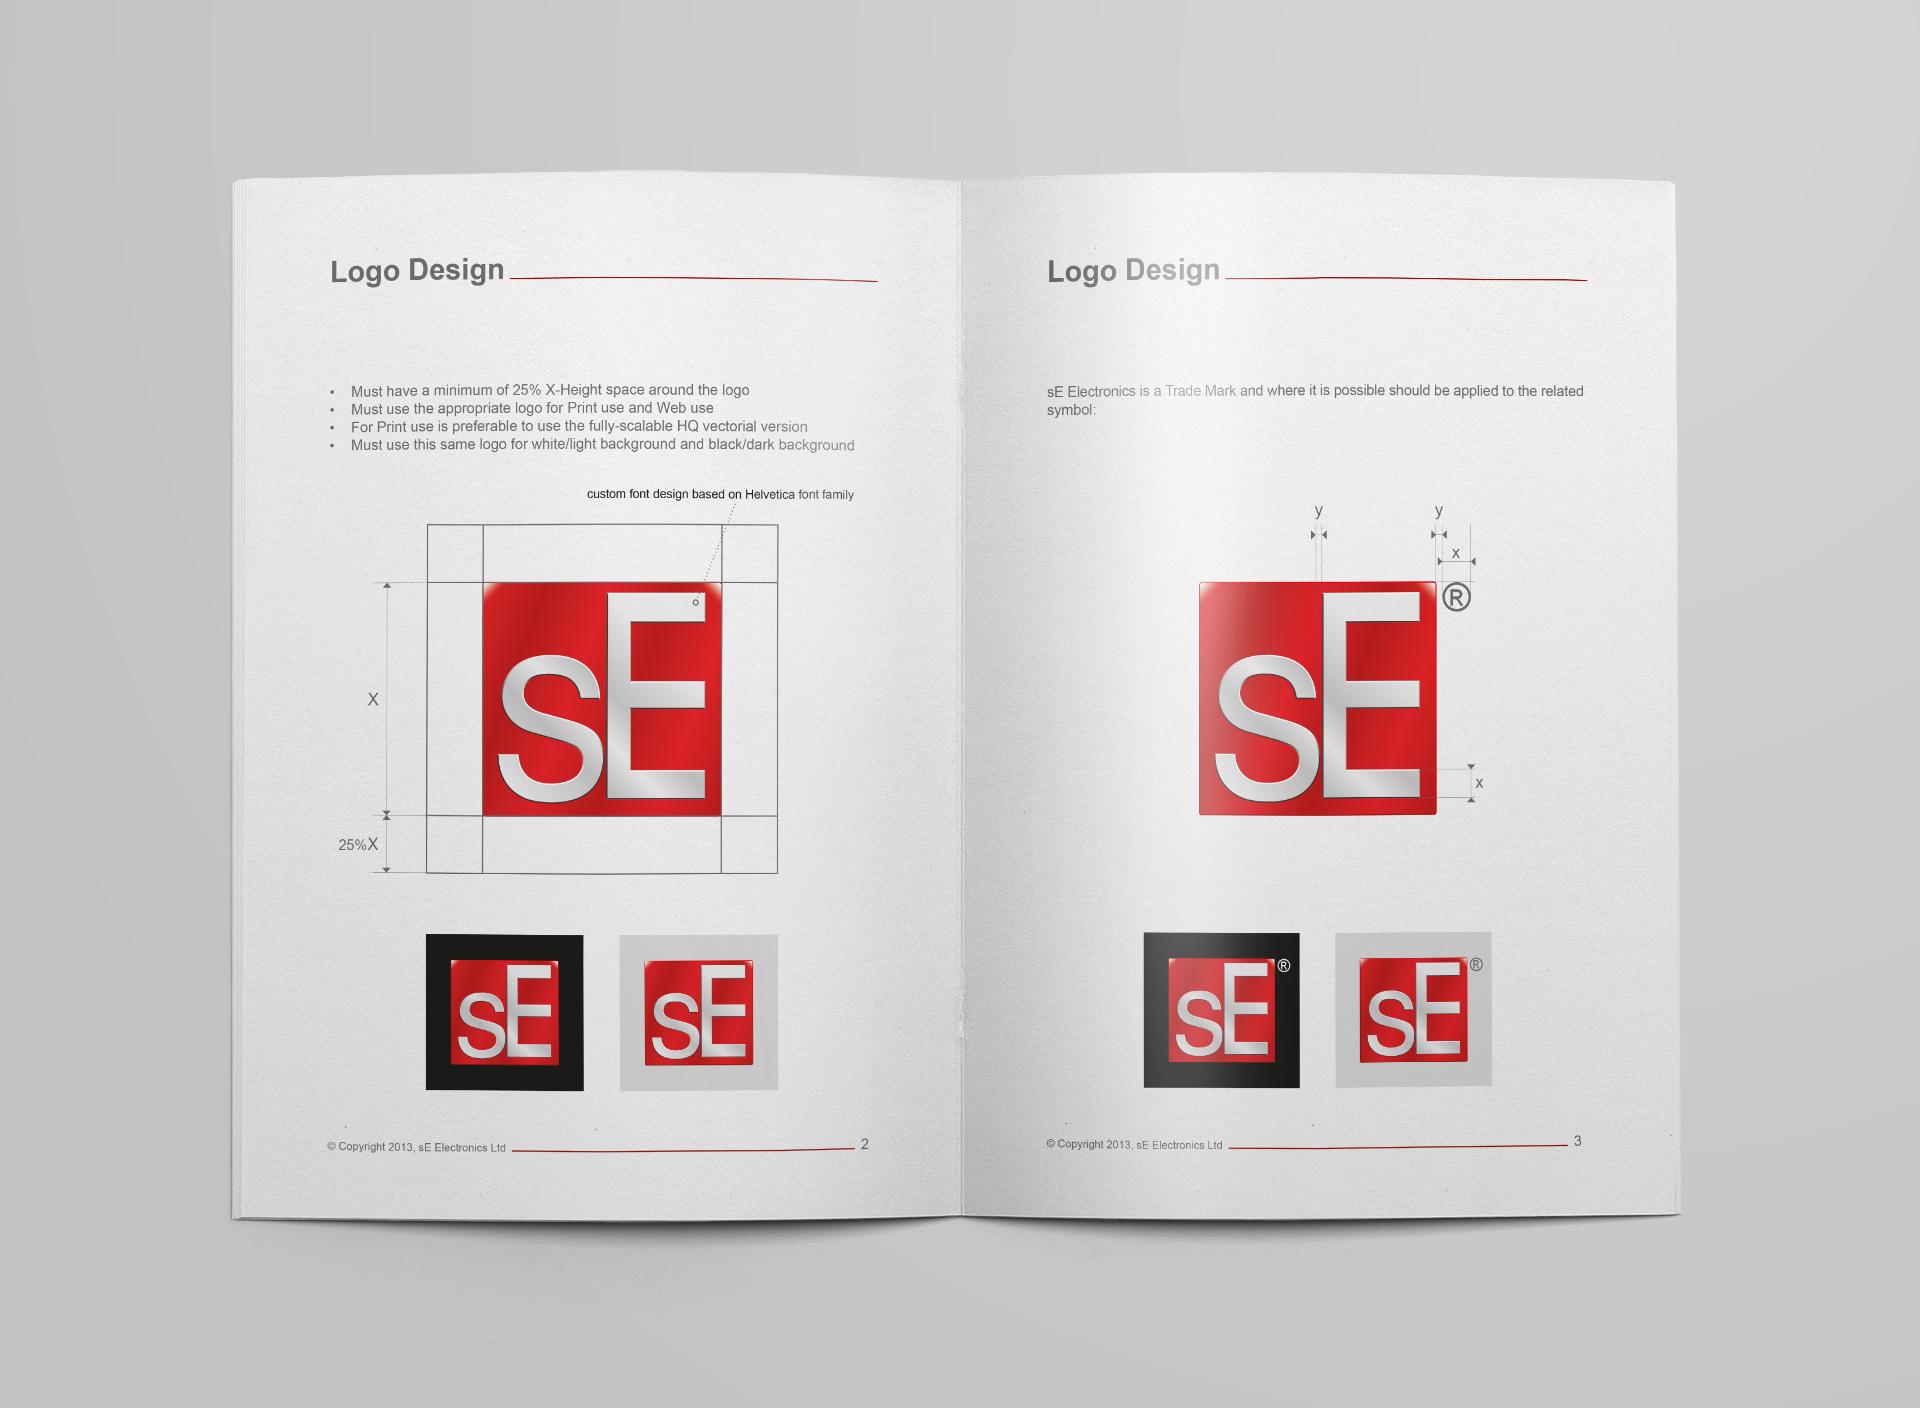 sE-guidelines-02-03